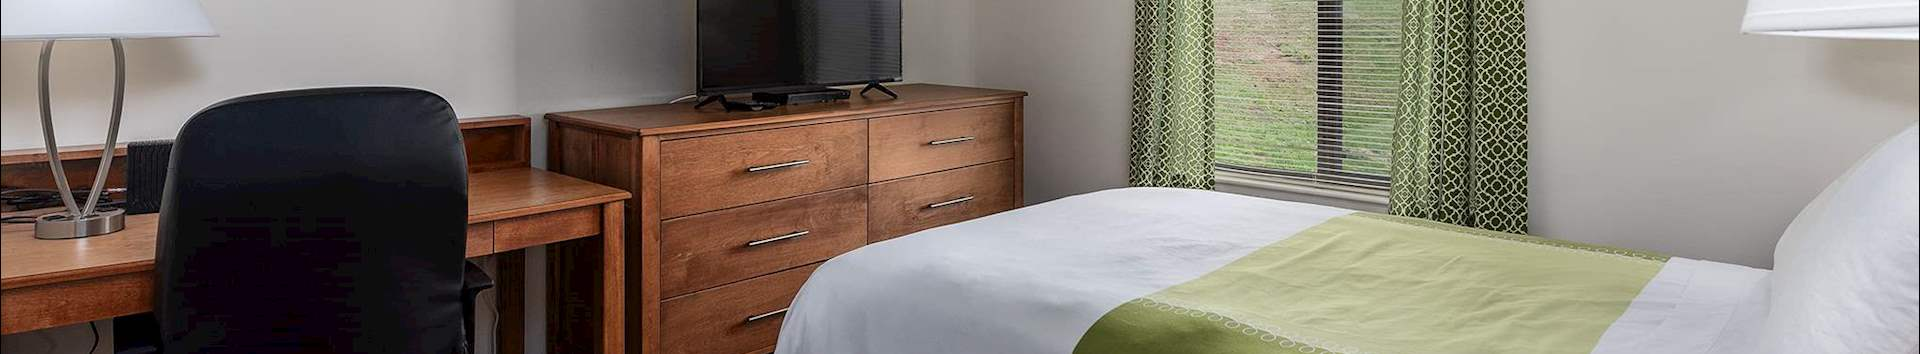 Room Inside view of Grampian Hills Apartments at Manor Communities, Williamsport/Pennsylvania